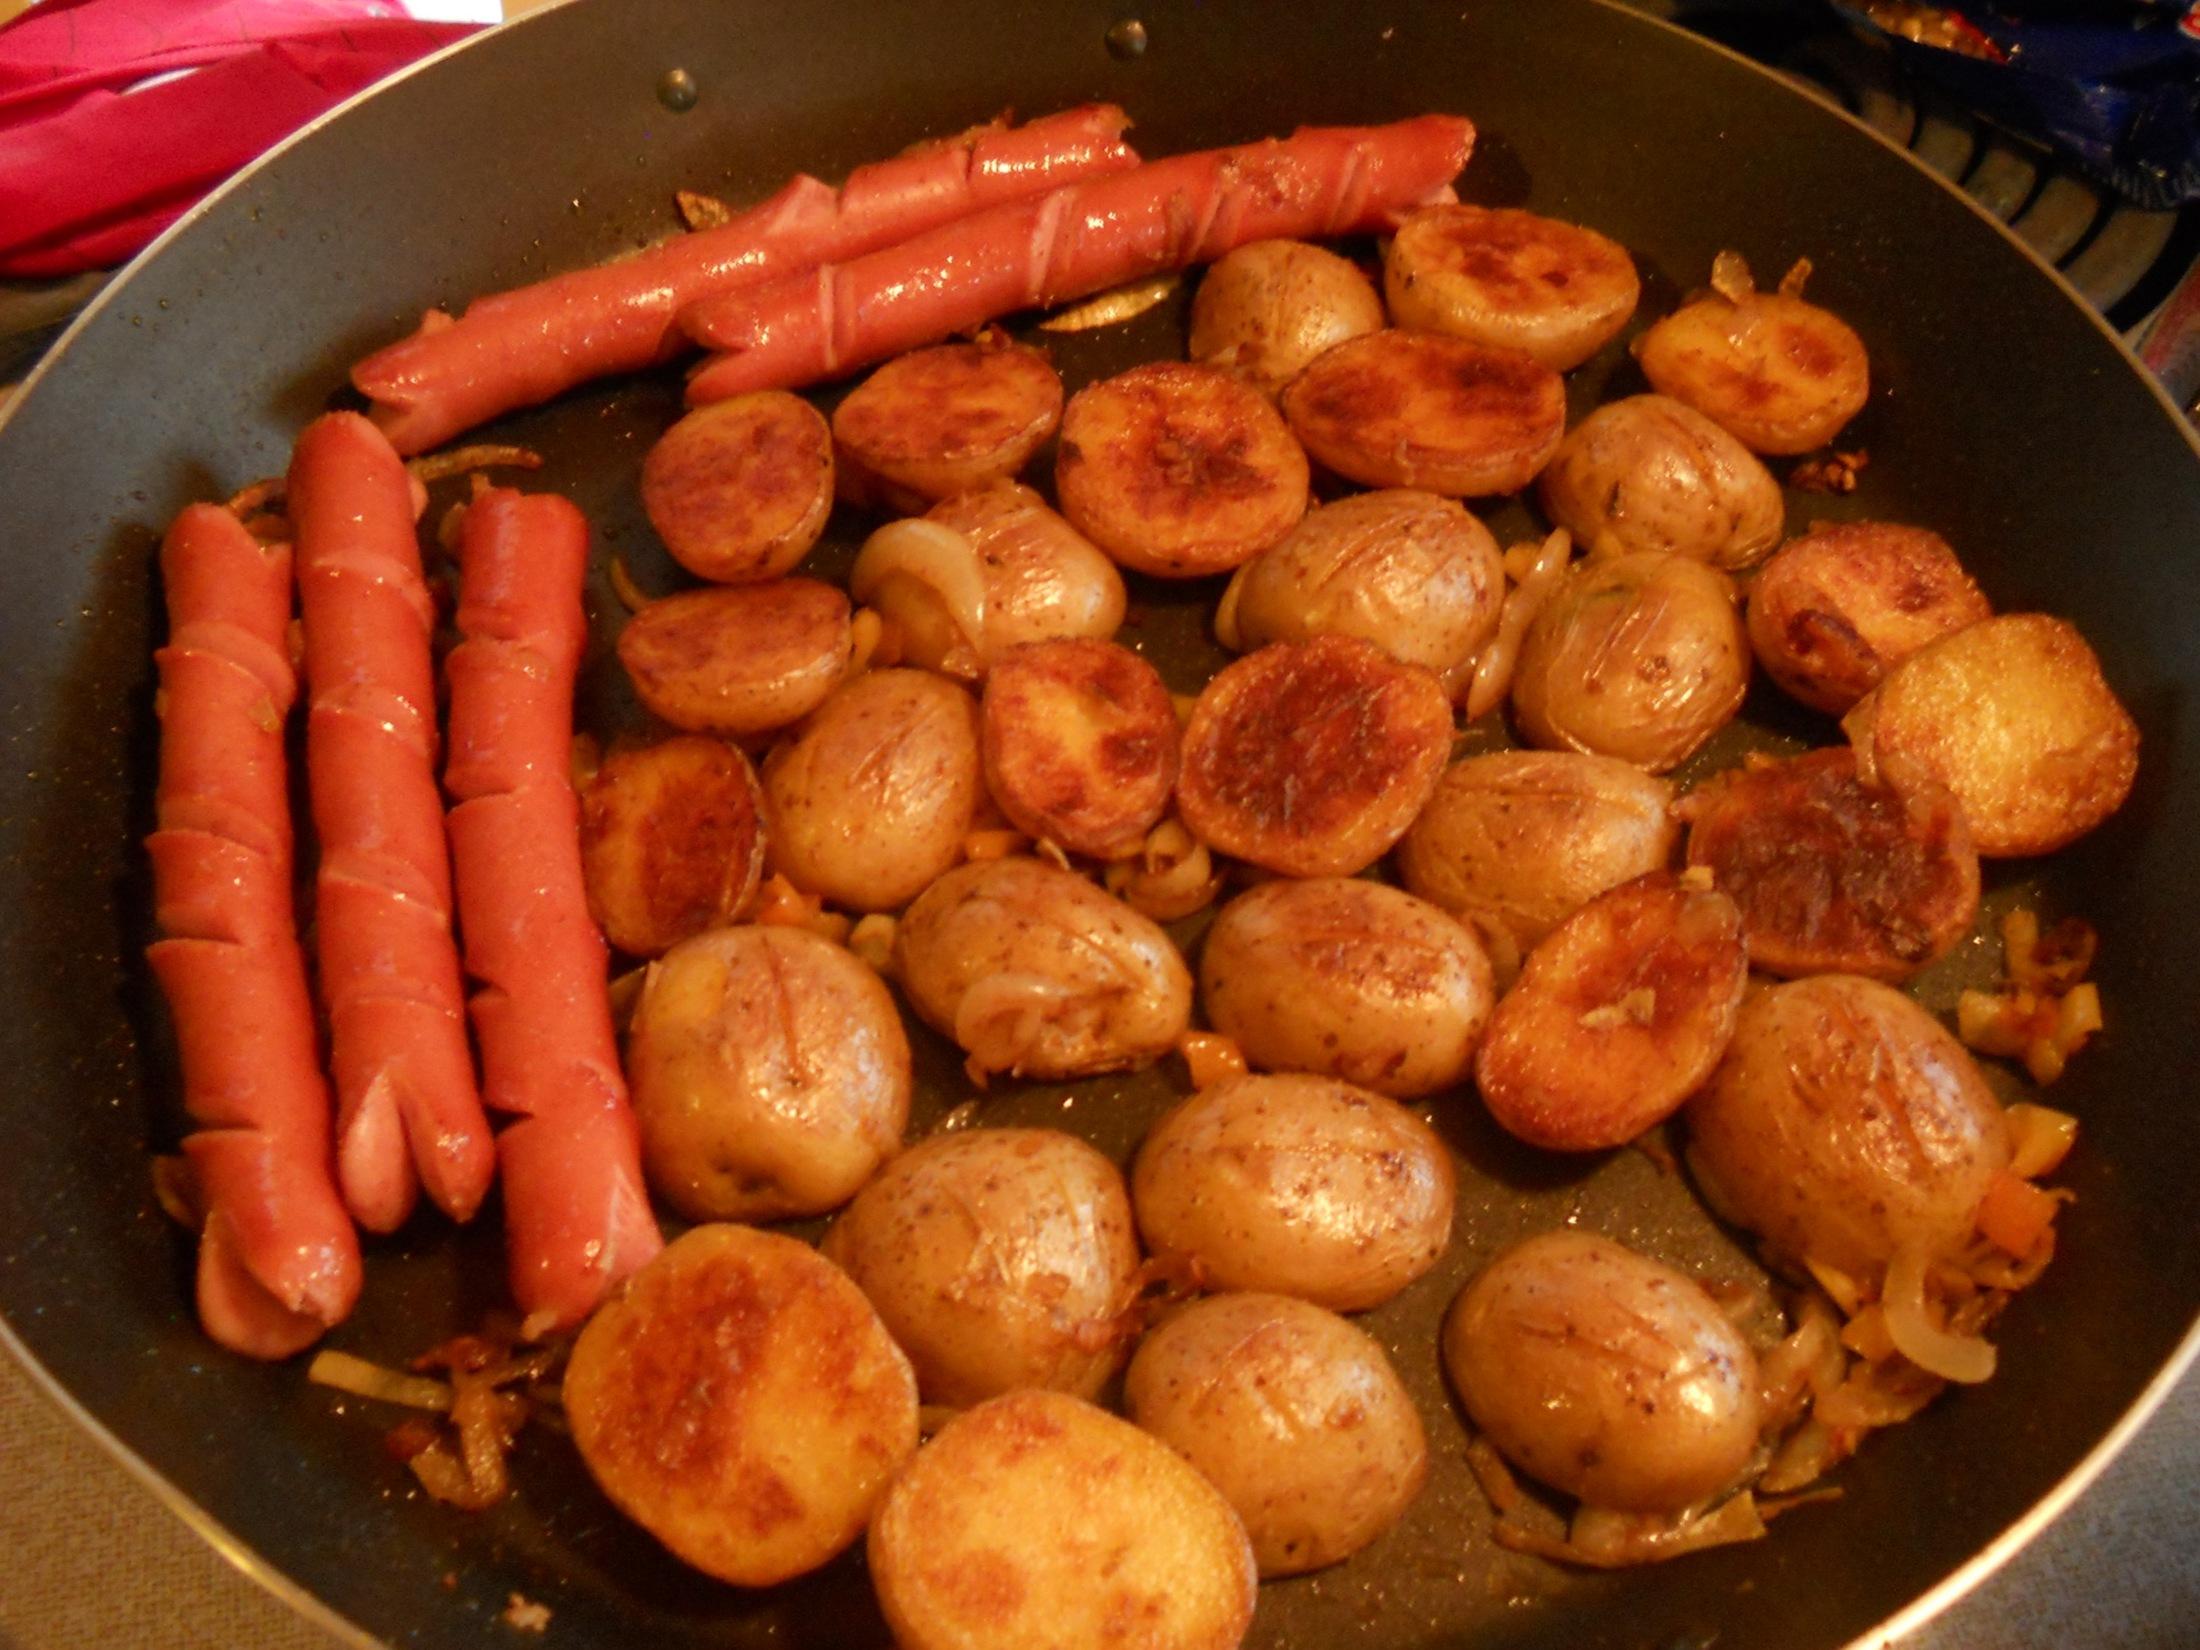 Brambory pečené v grilu s párkem